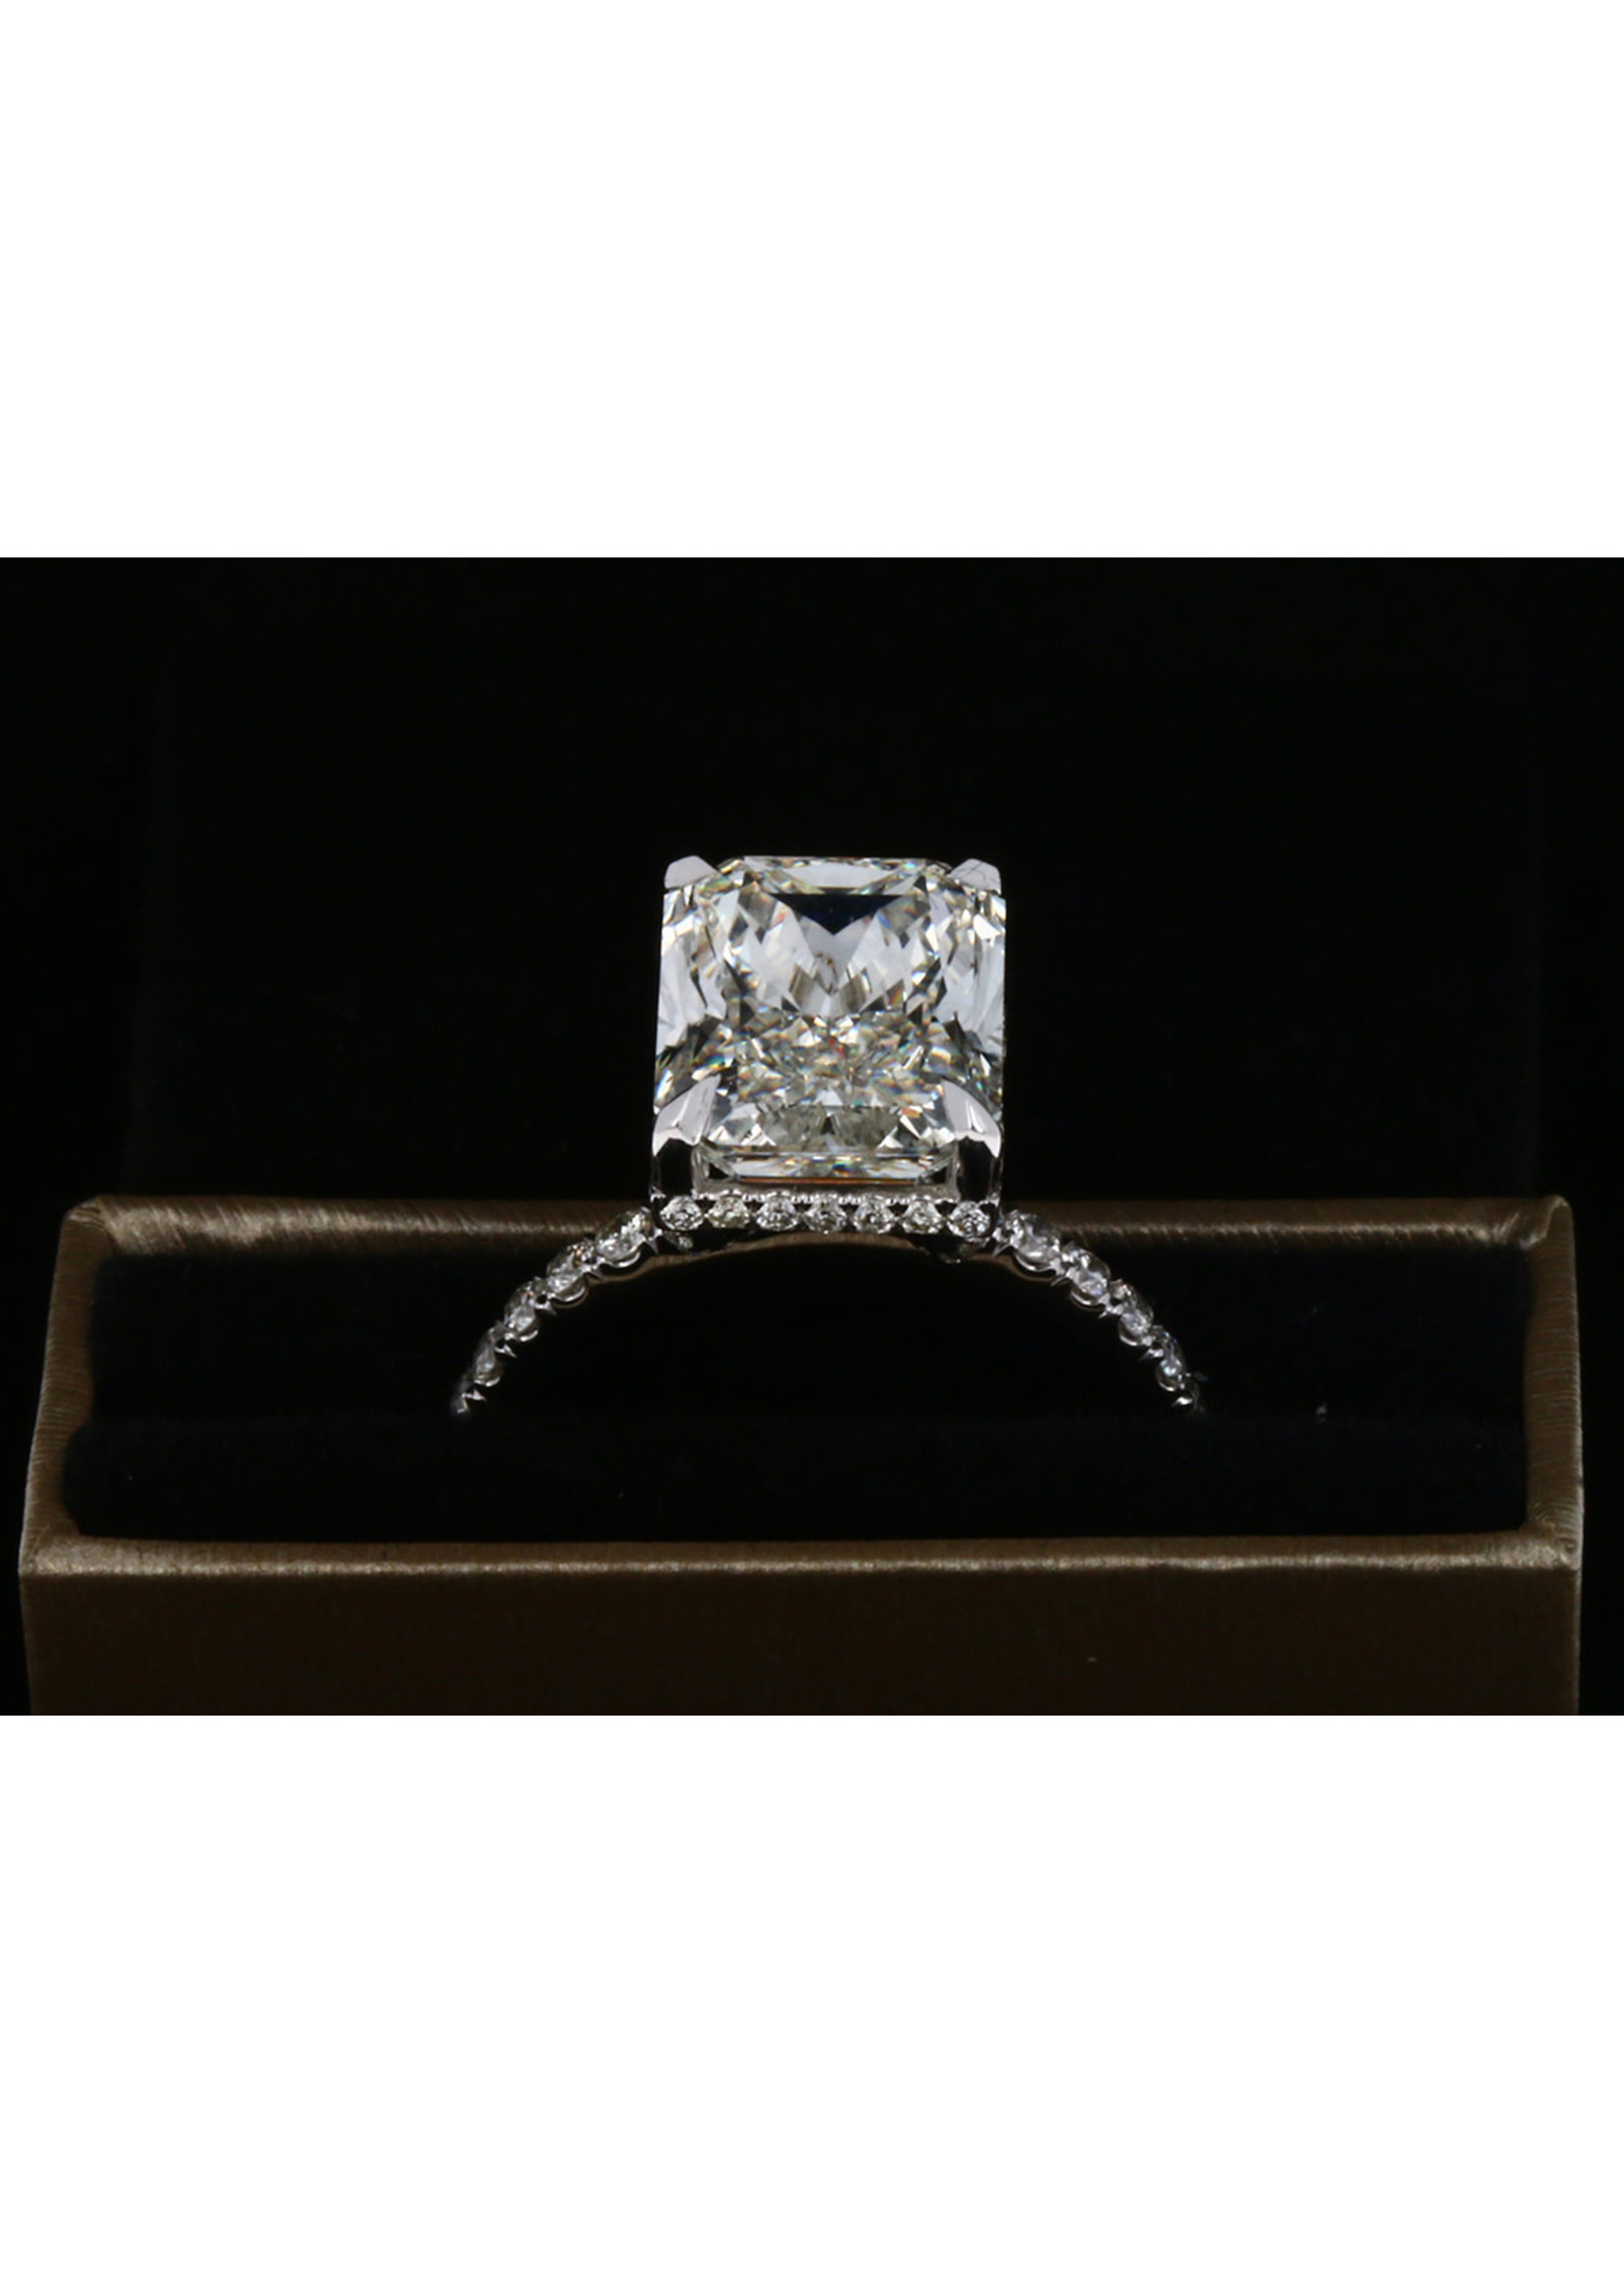 5.82 RADIANT CUT DIAMOND RING SI-I